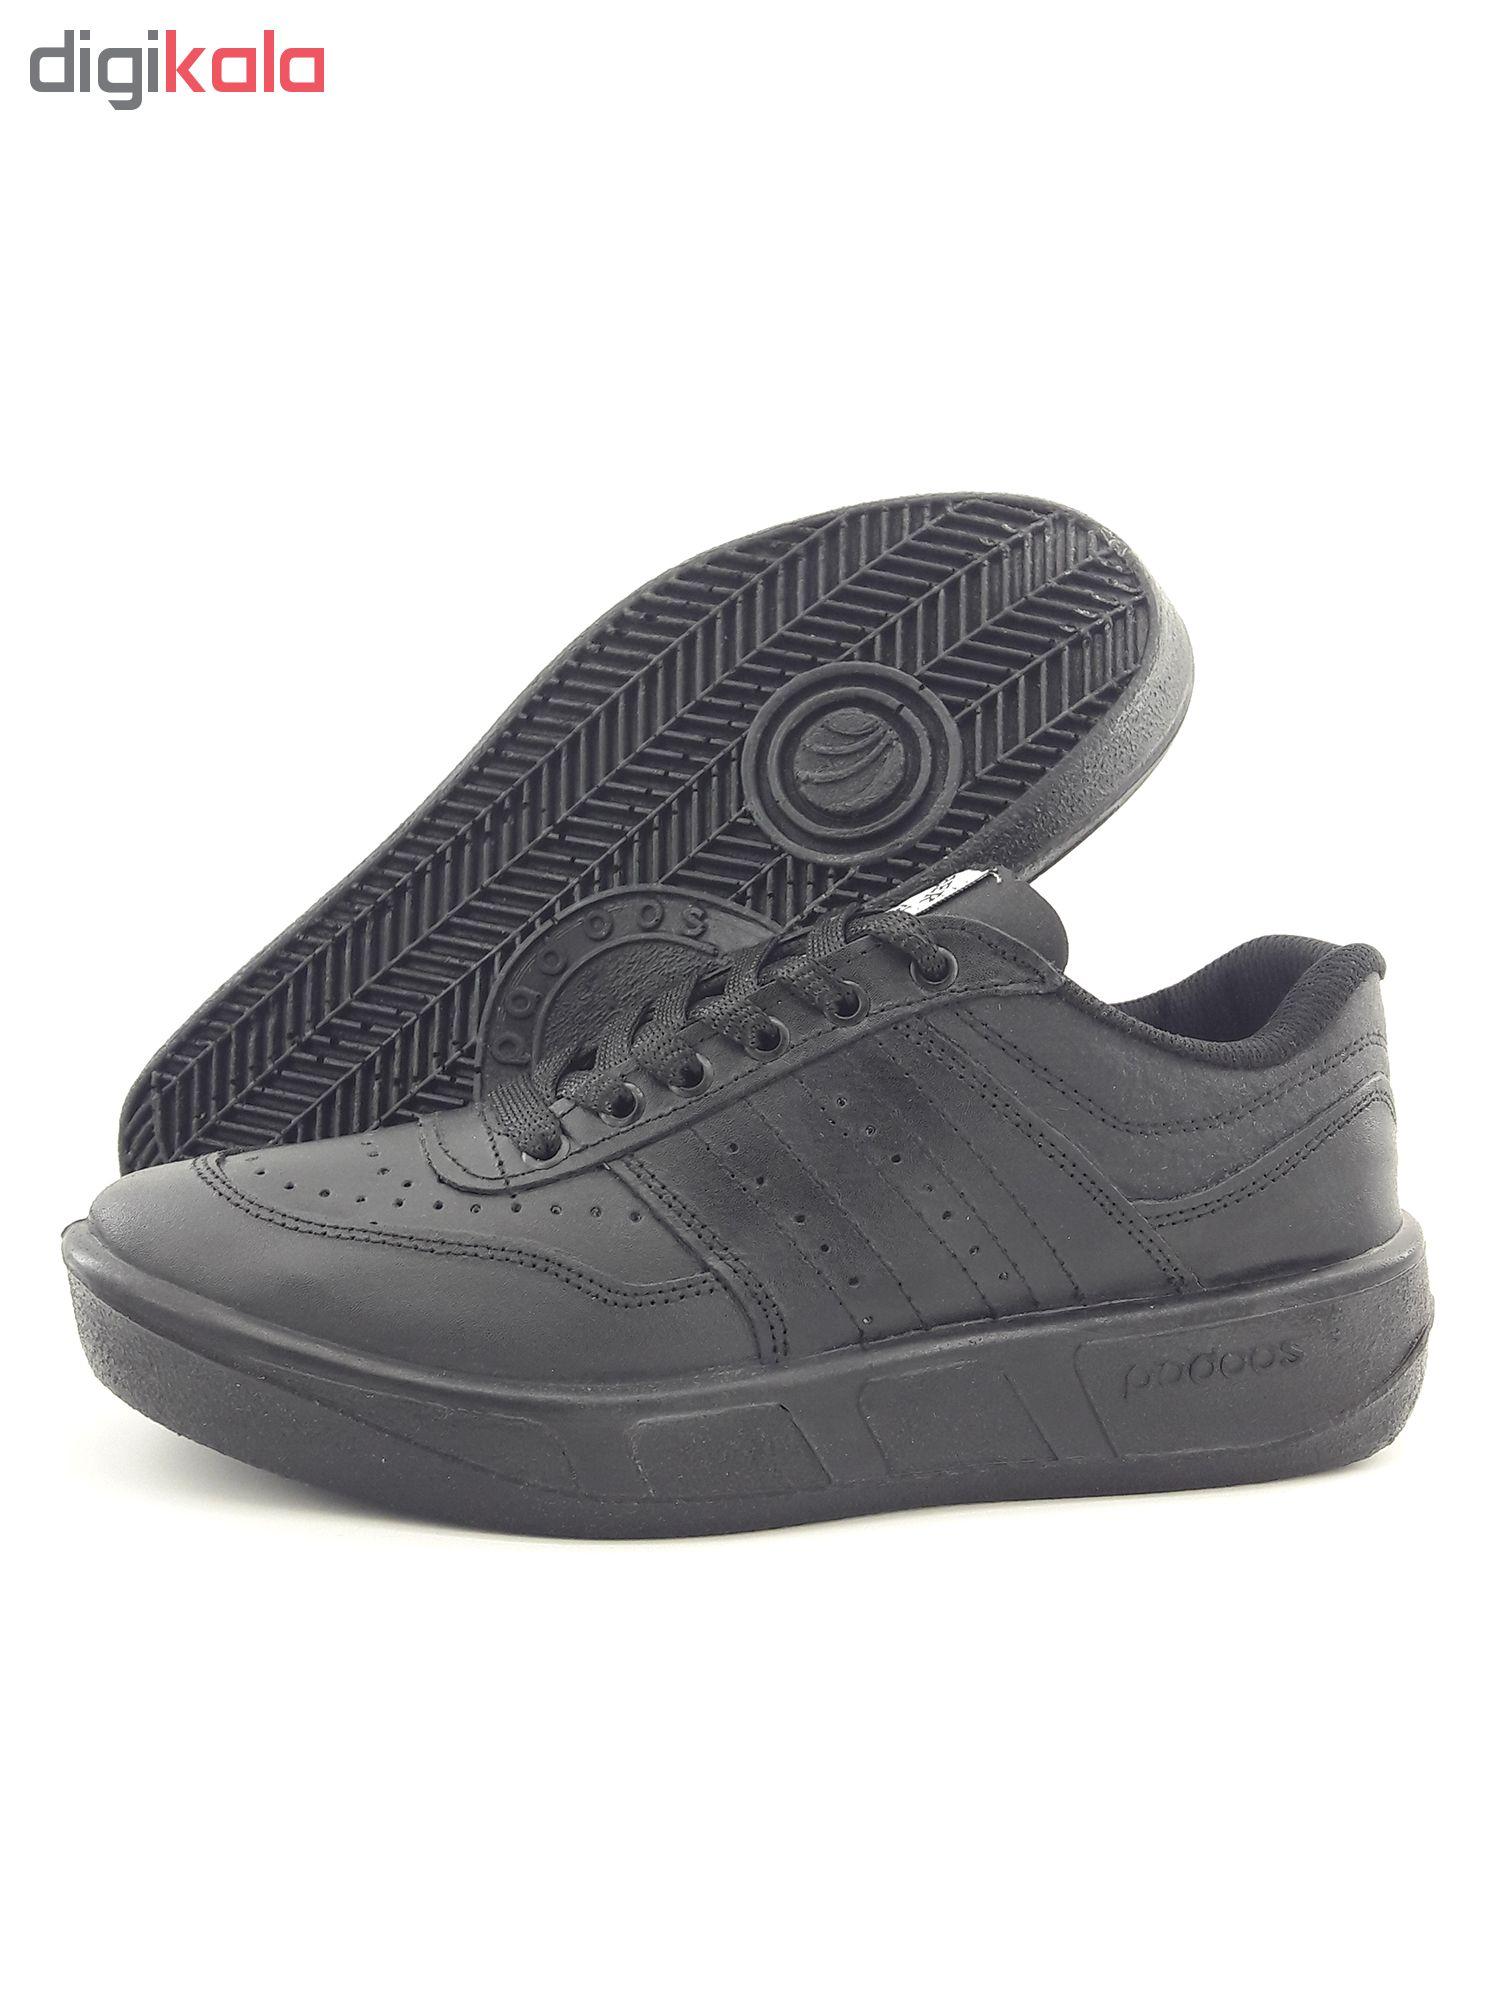 کفش راحتی مردانه پادوز مدل Parsa bl01